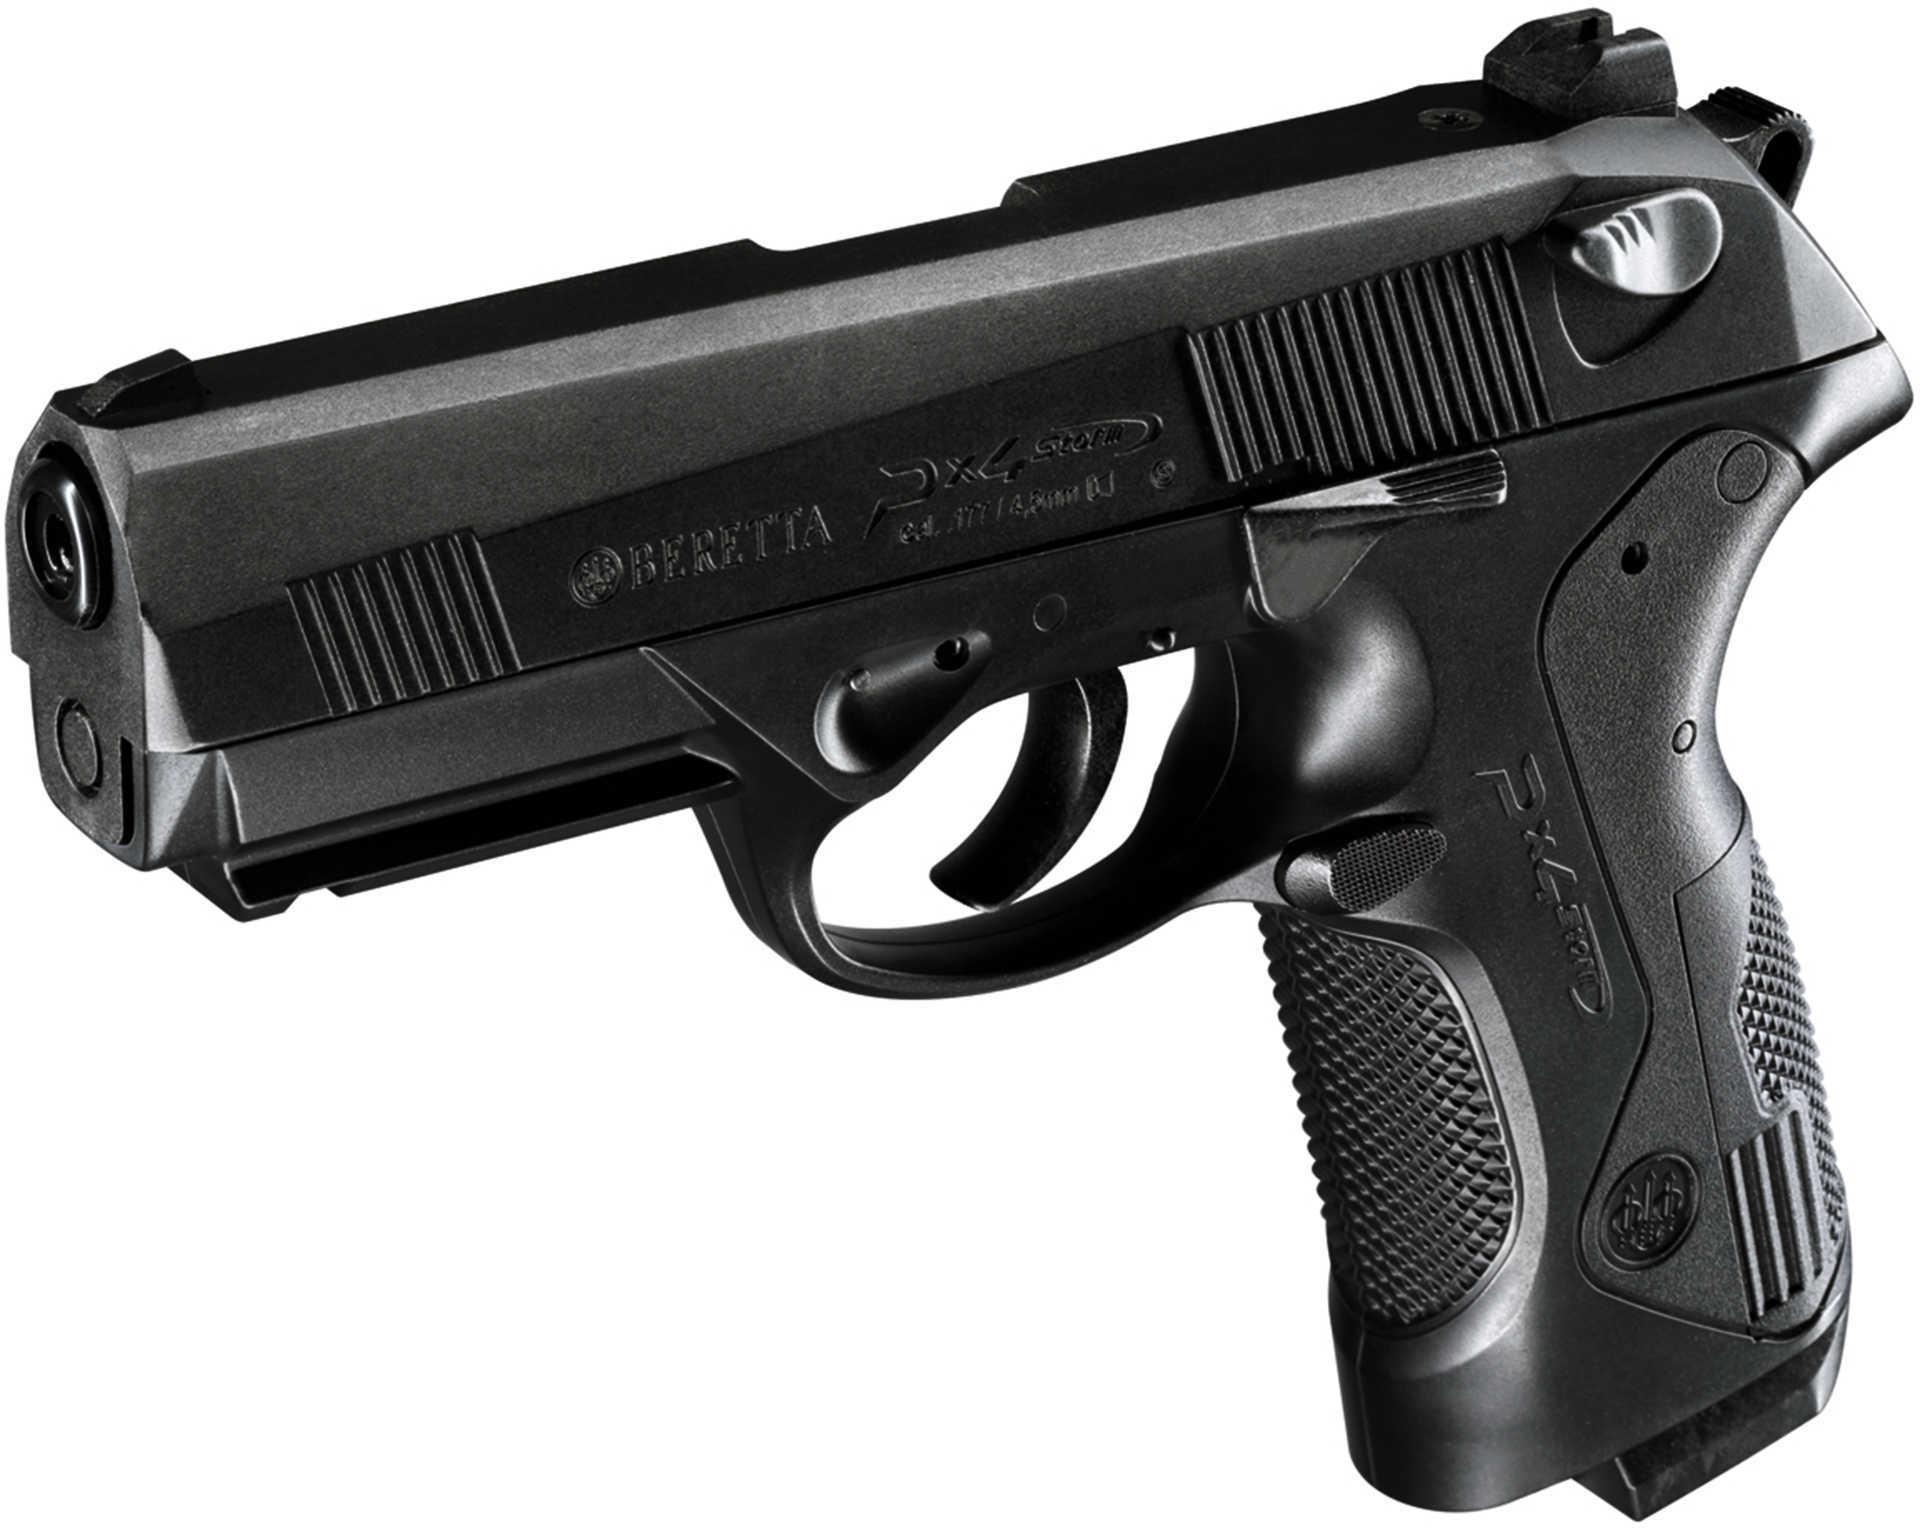 Umarex USA Pistol, .177 Caliber PX4 Storm .177 Pellet Md: 225-3004